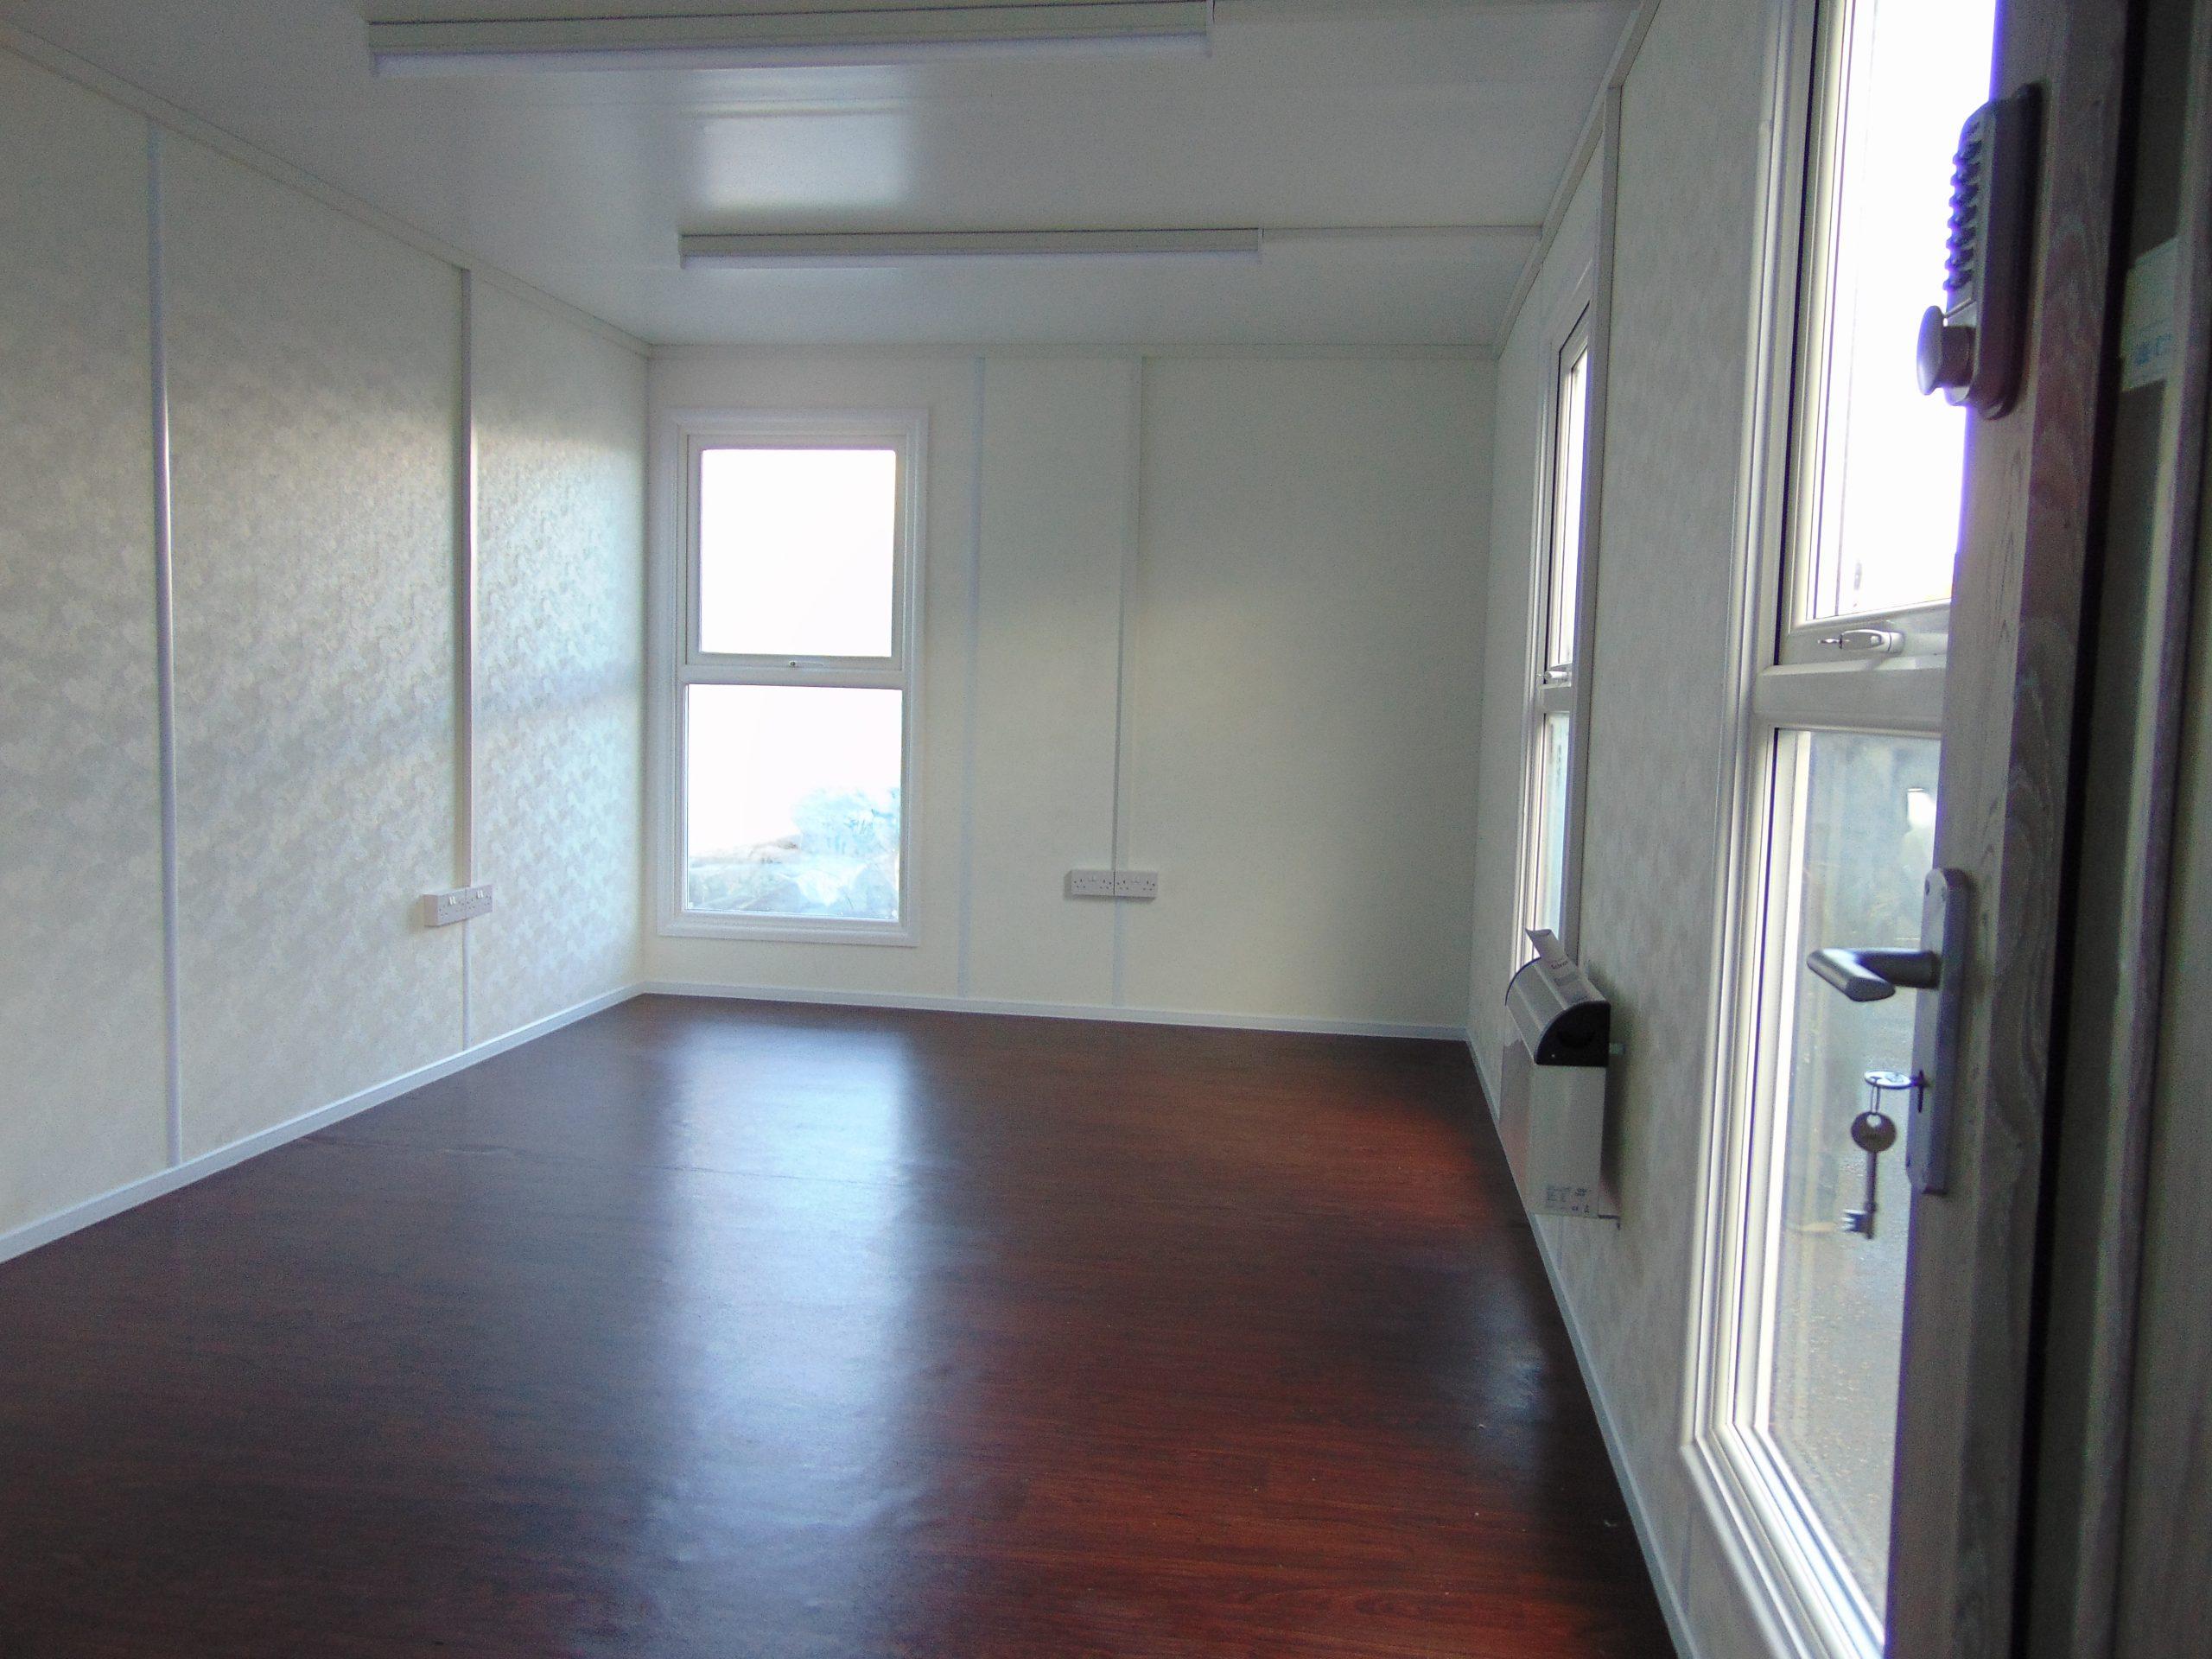 40' x 10' portable office cabin refurbishment, large double glazed windows